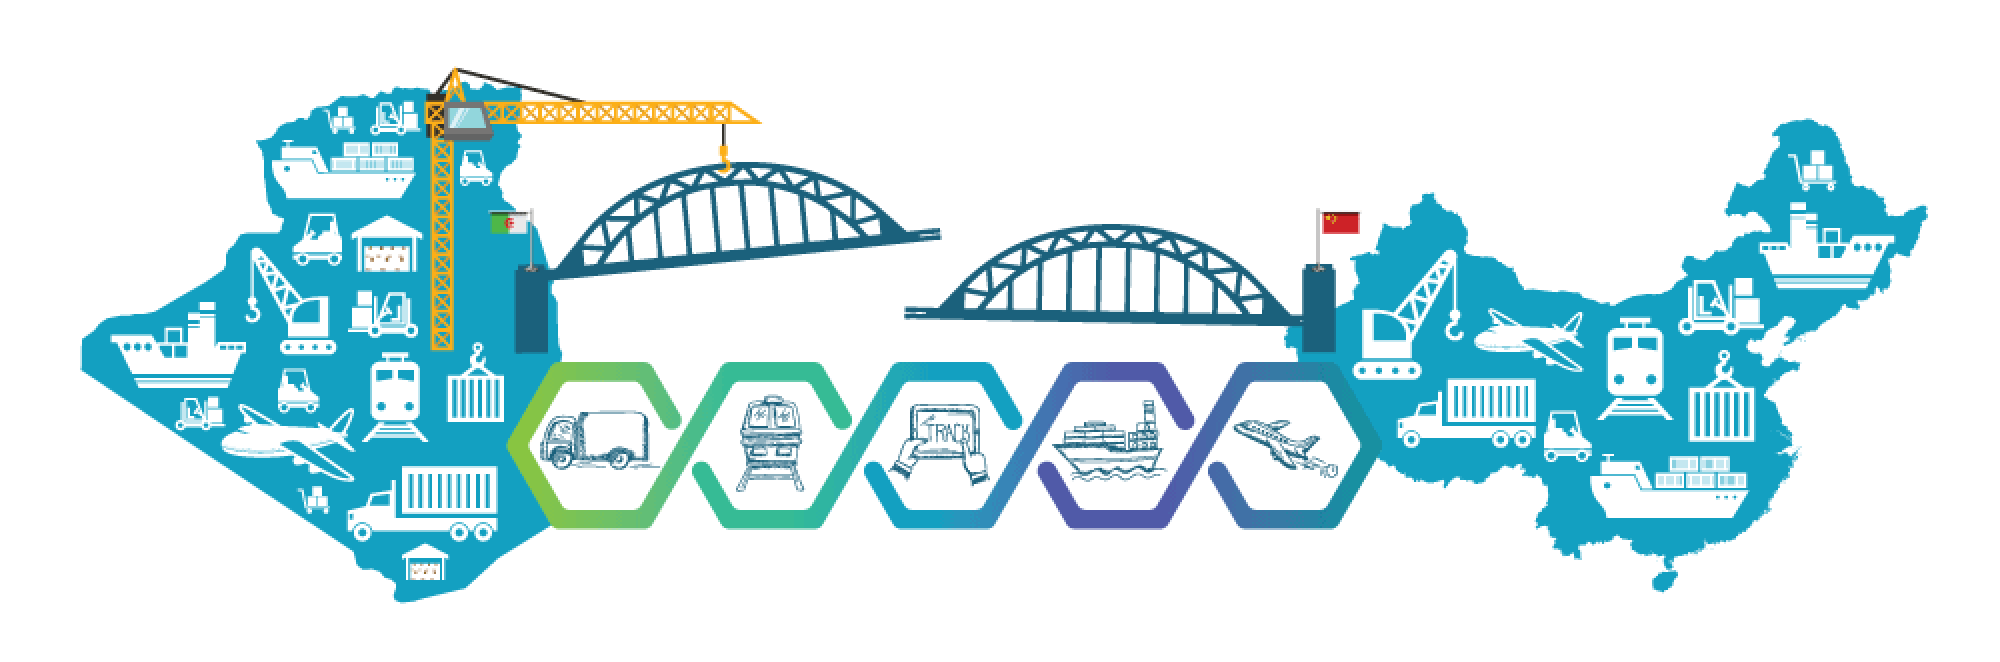 sittem-2018-front-plan